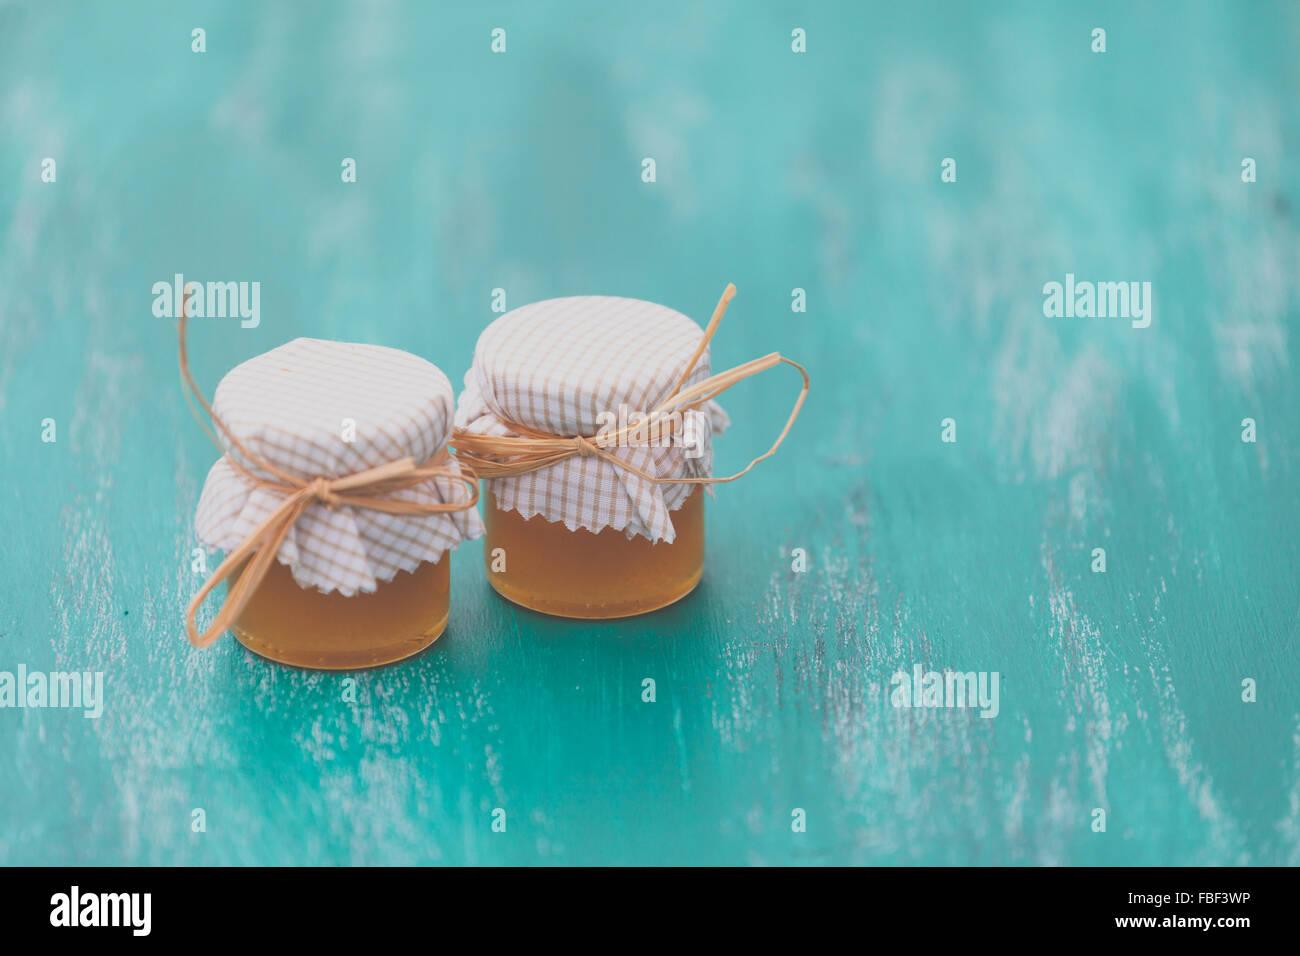 Plan de pots de miel recouvert de tissu sur la table Photo Stock